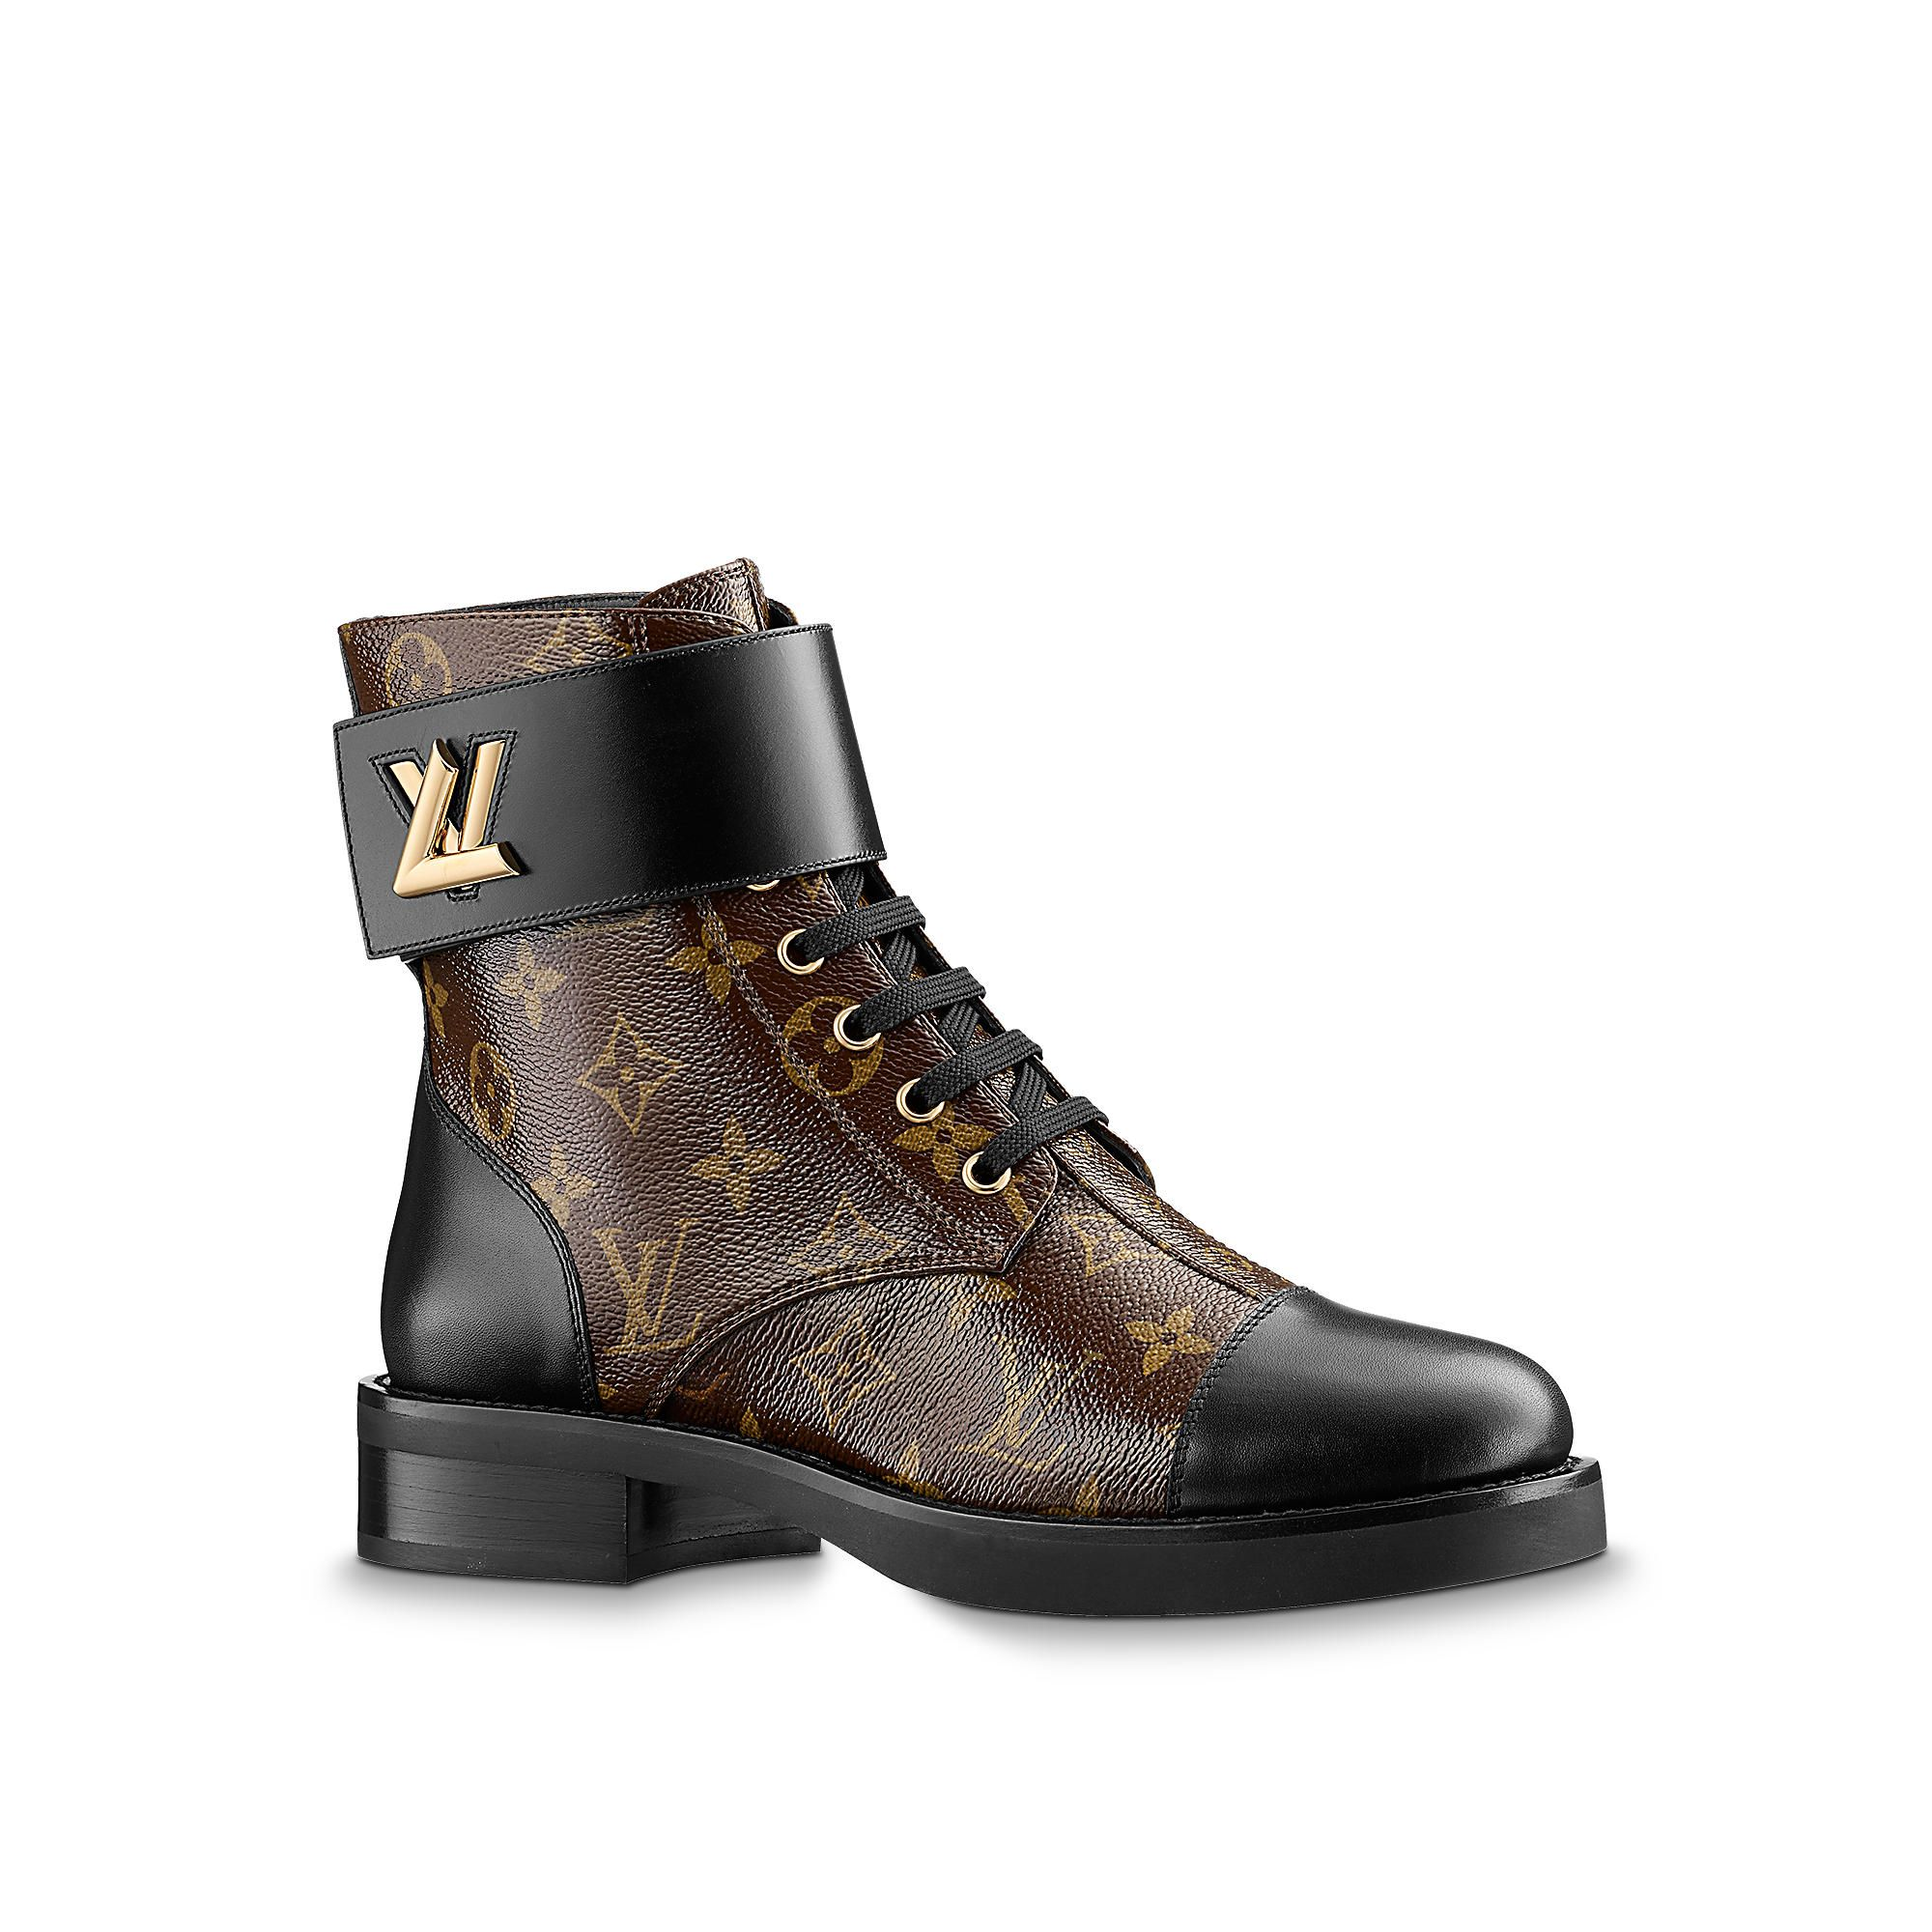 Louis Vuitton Hiking Boots - Kim Jones